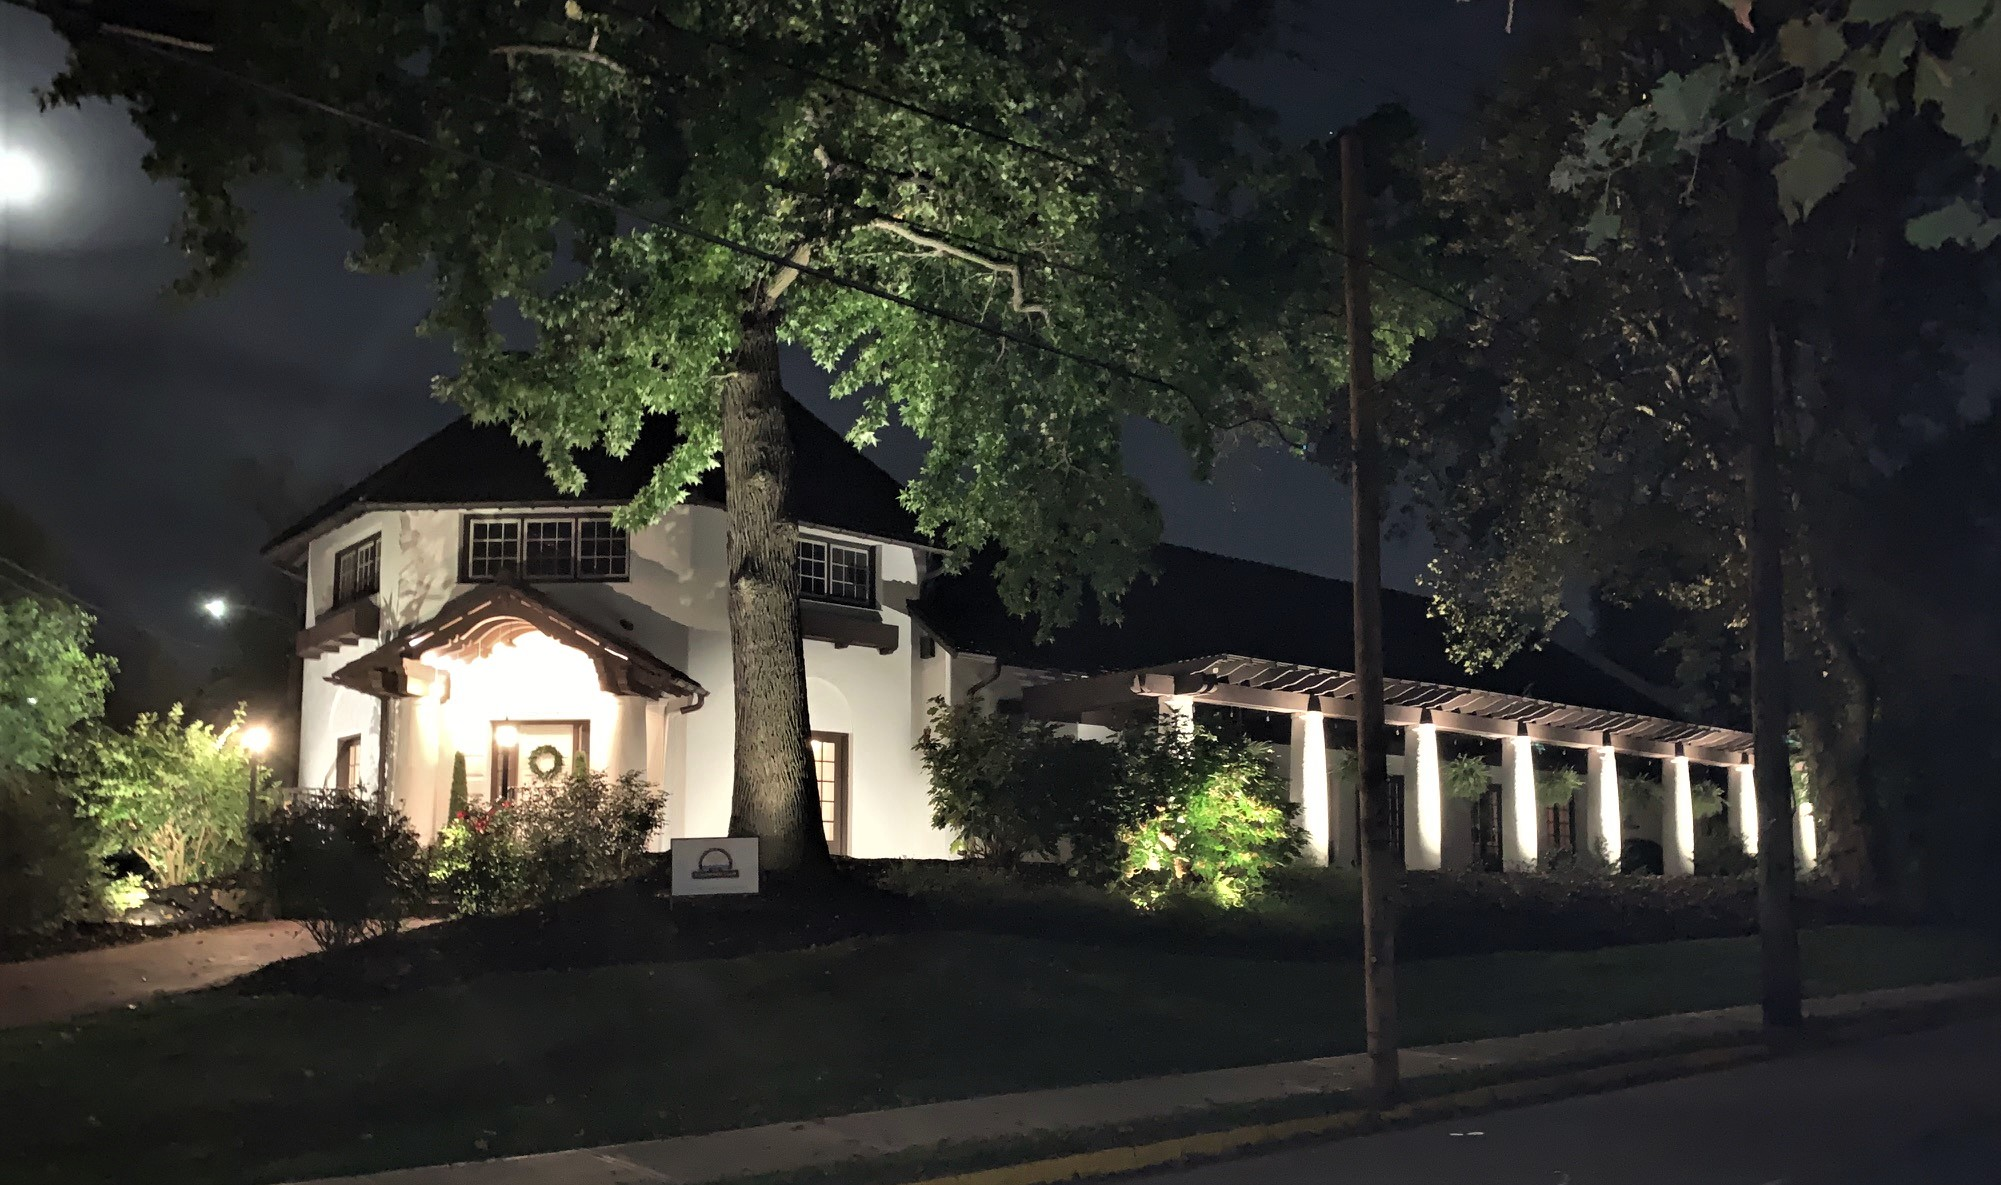 The Edgewood Club